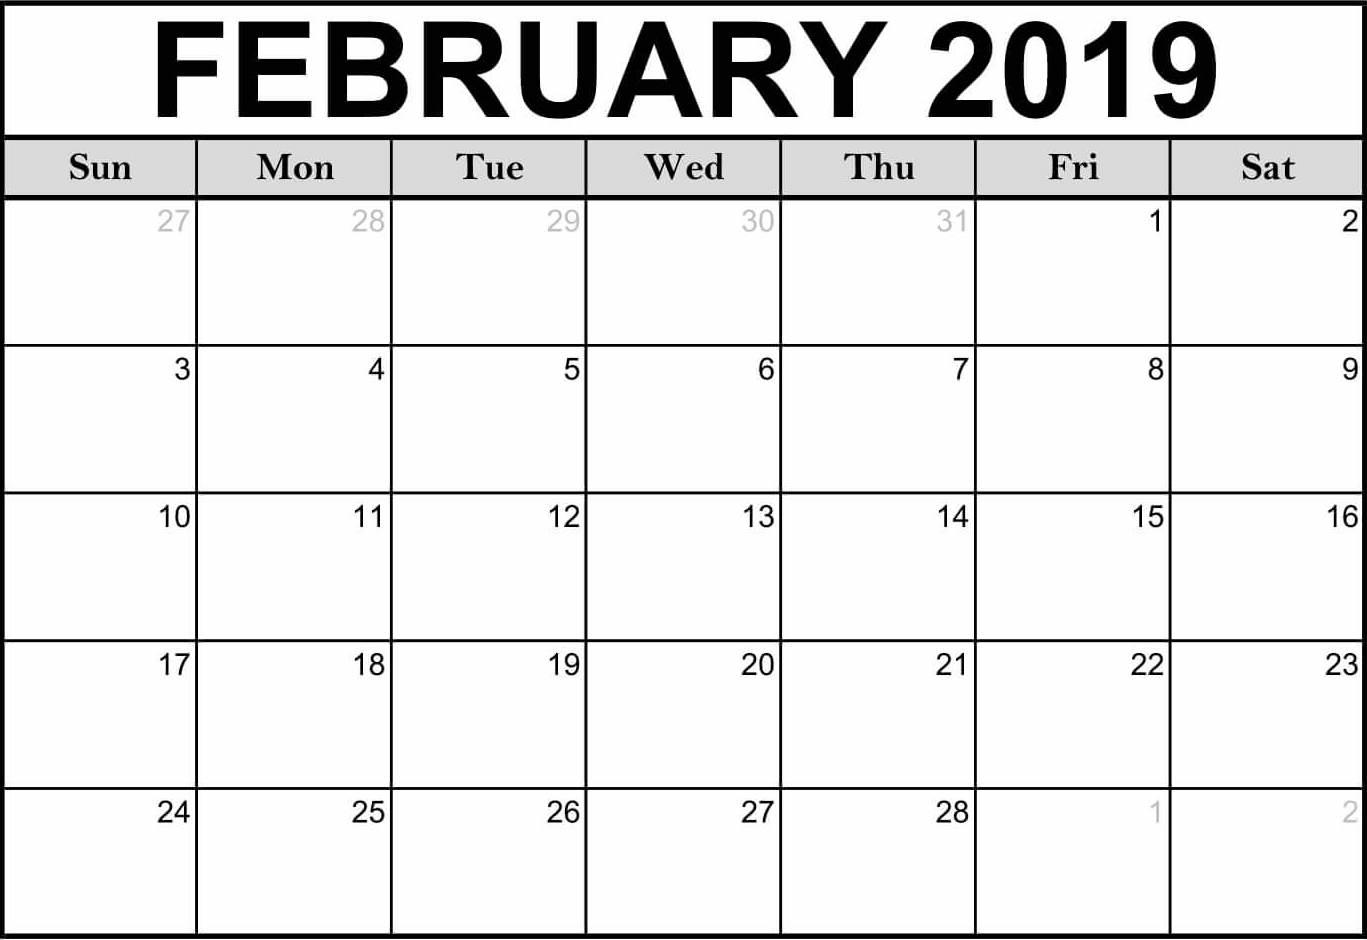 february-2019-calendar